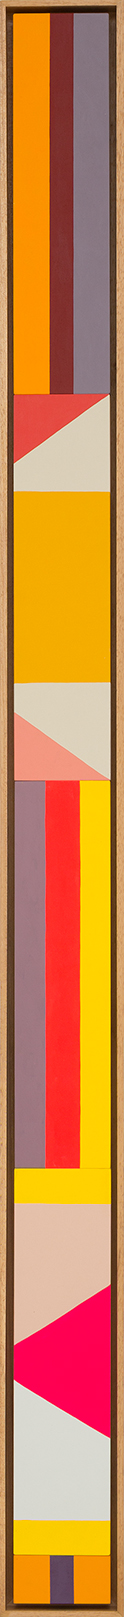 LOUISE TUCKWELL  Return to Paradise 2015  acrylic on board 165 x 10 cm